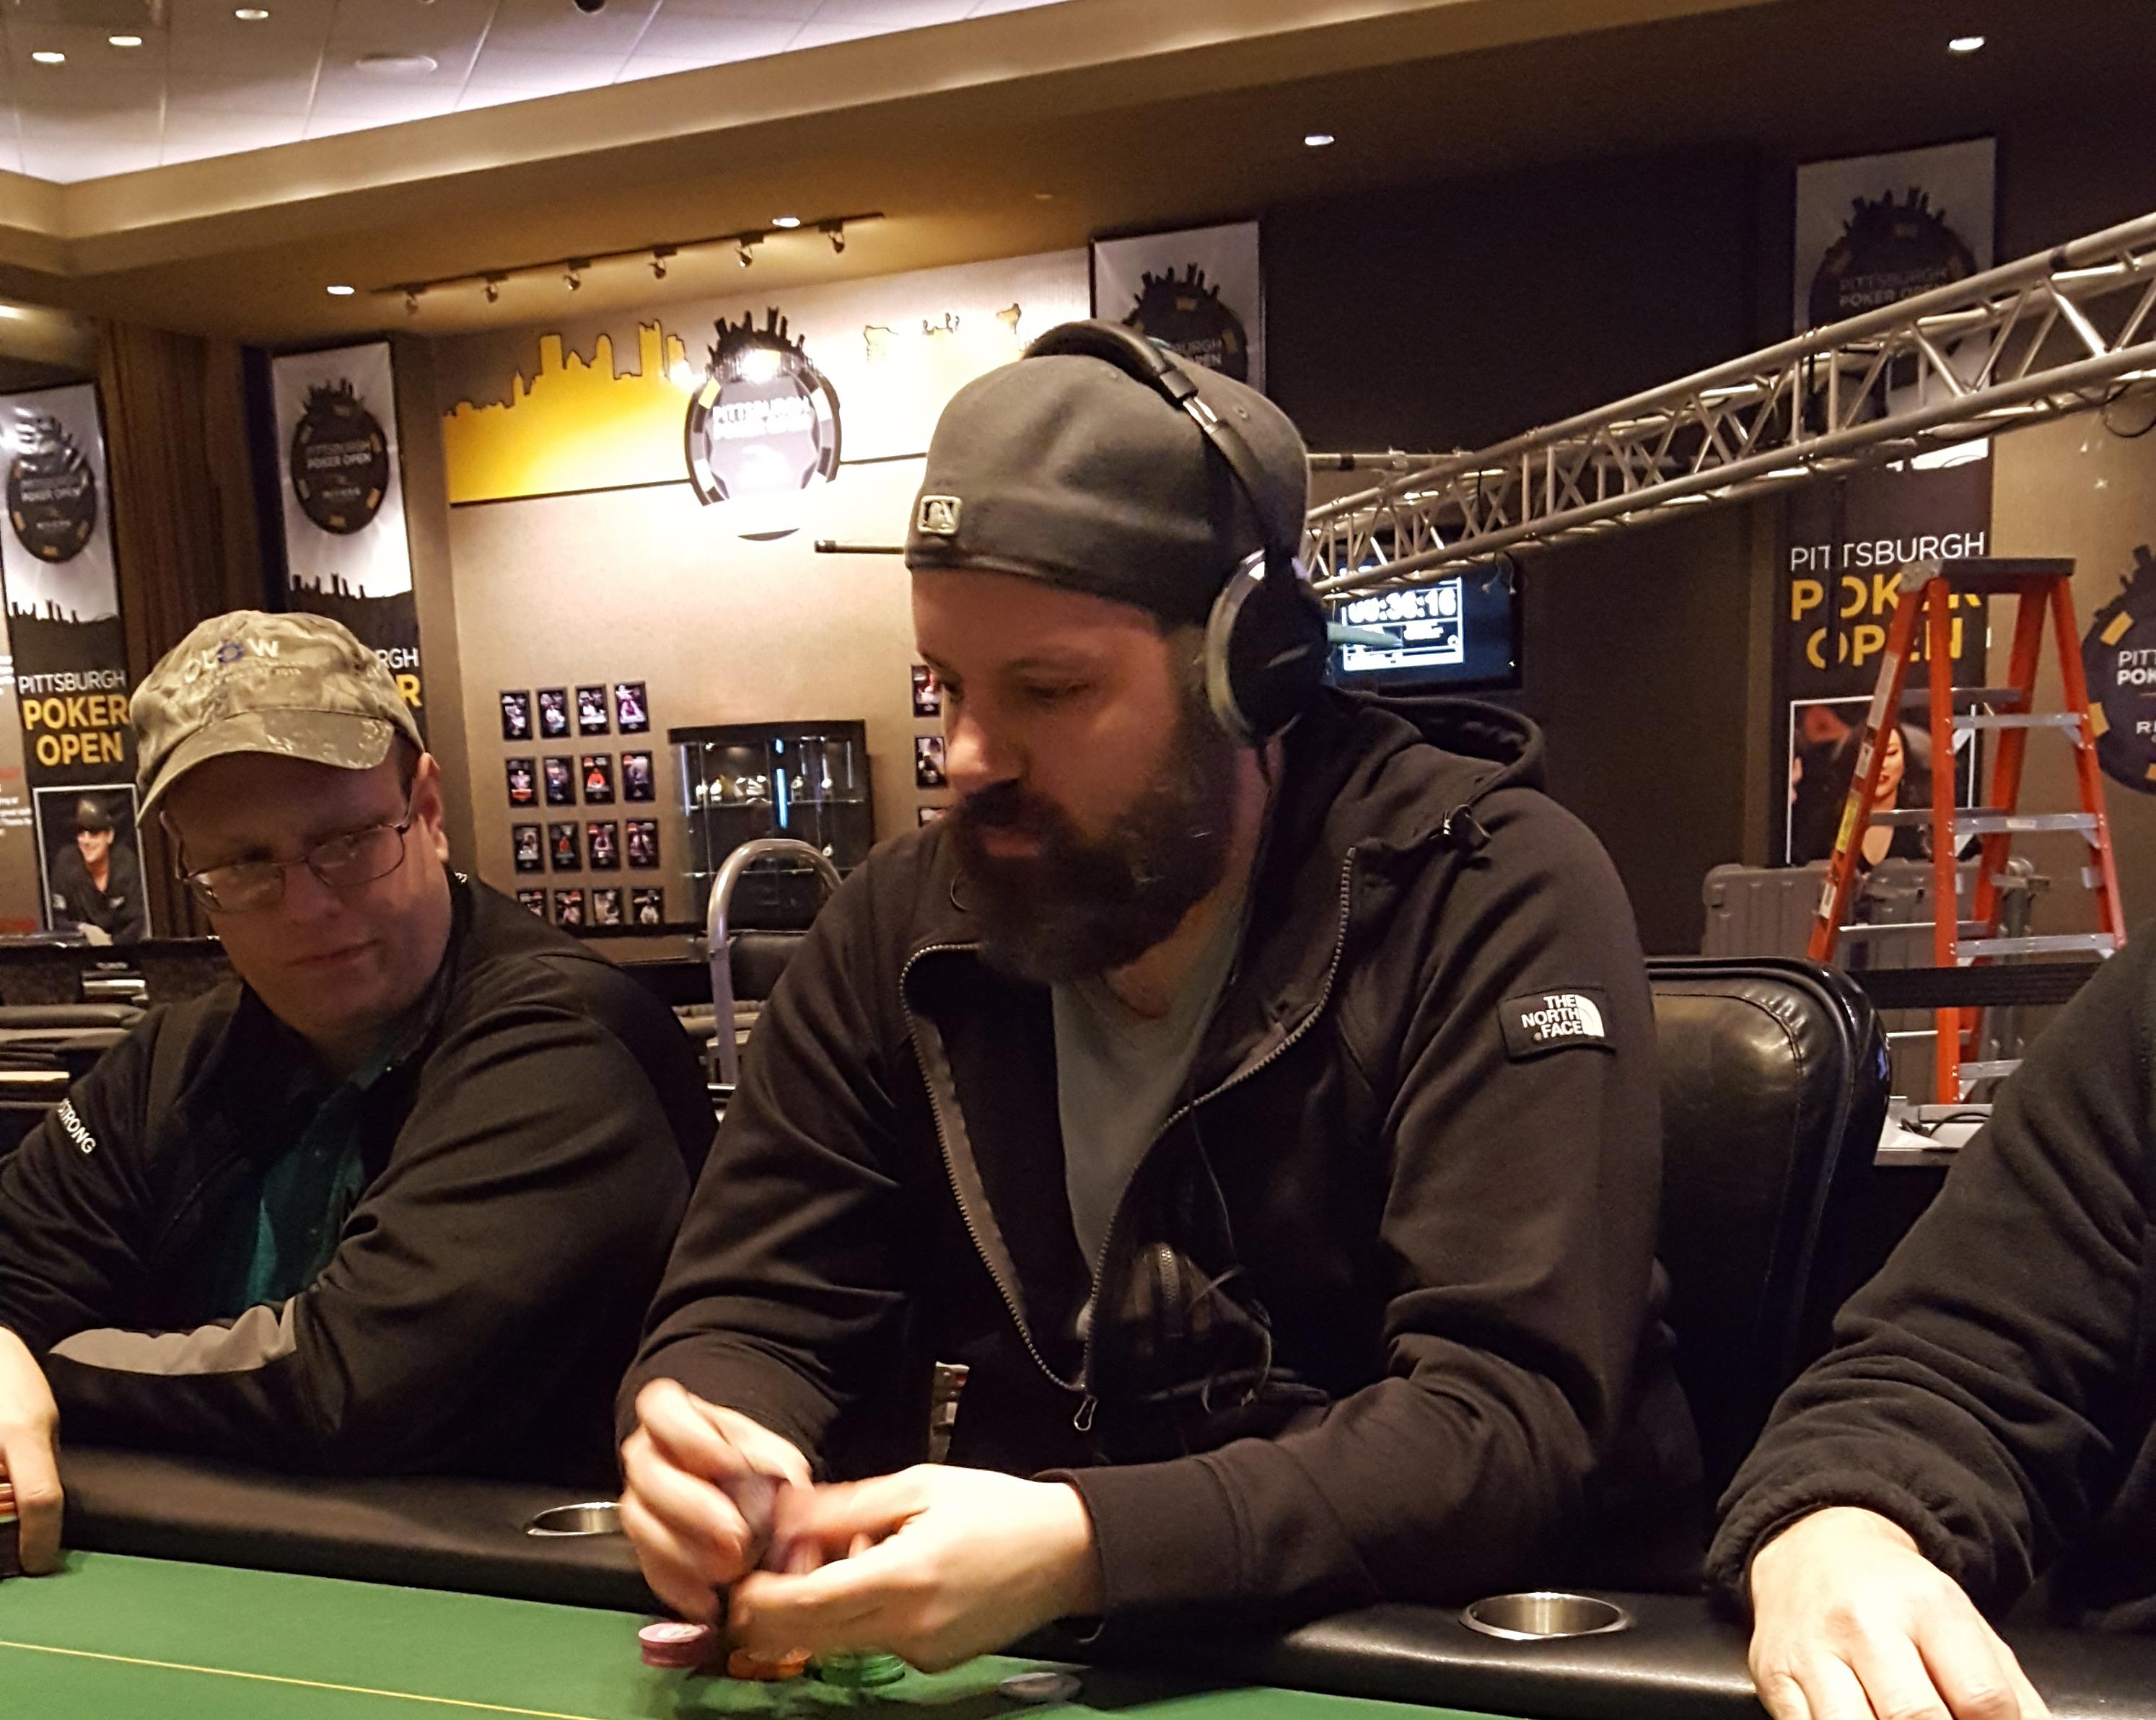 Pittsburgh poker tournaments casino equipments